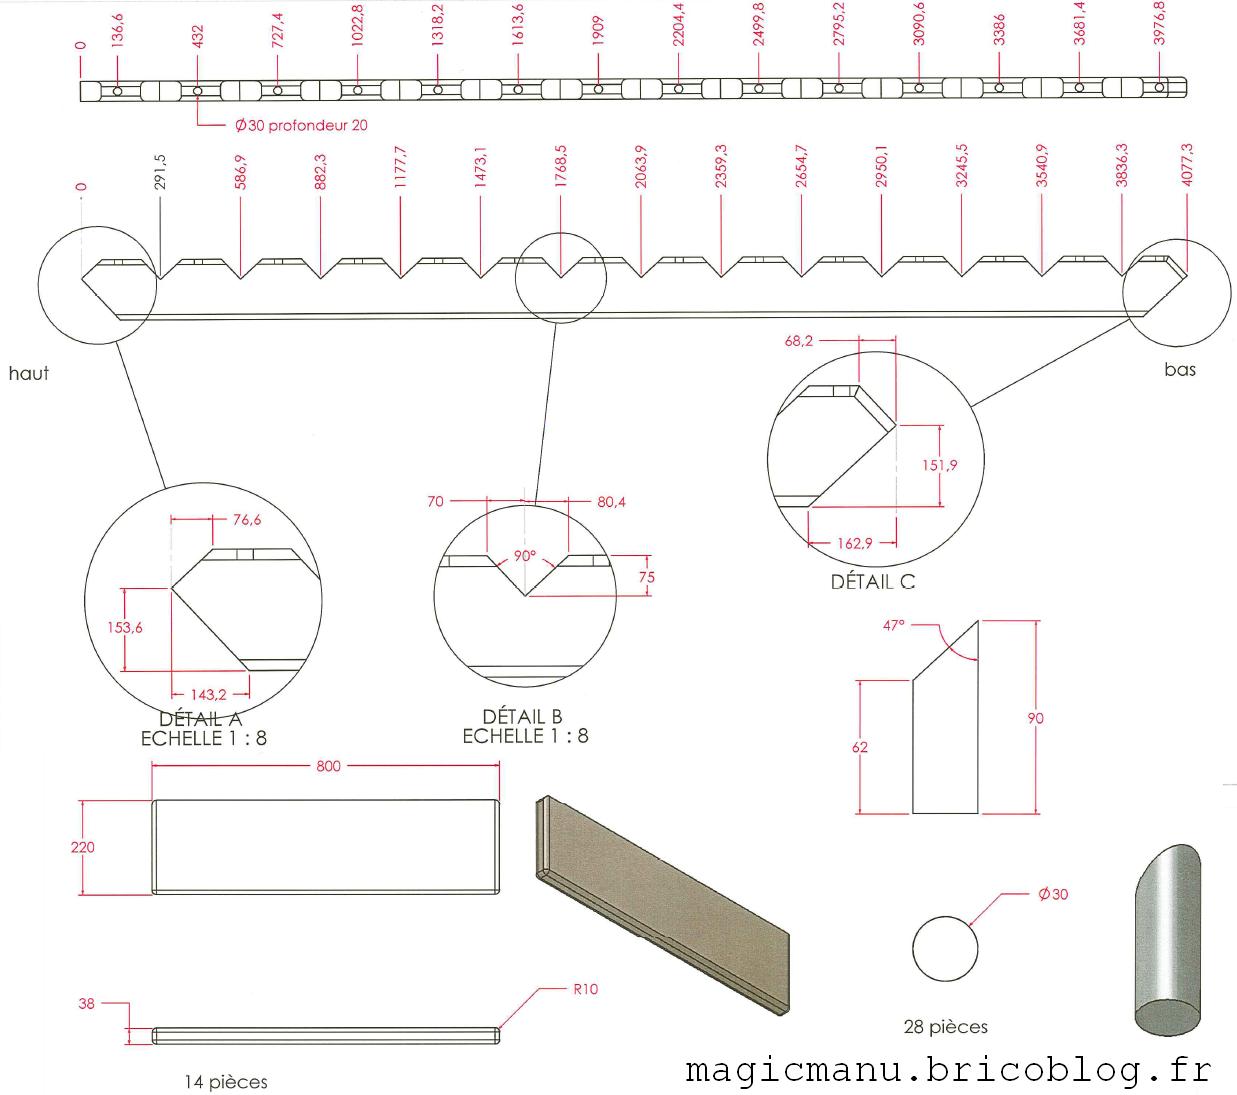 fabriquer son escalier. Black Bedroom Furniture Sets. Home Design Ideas